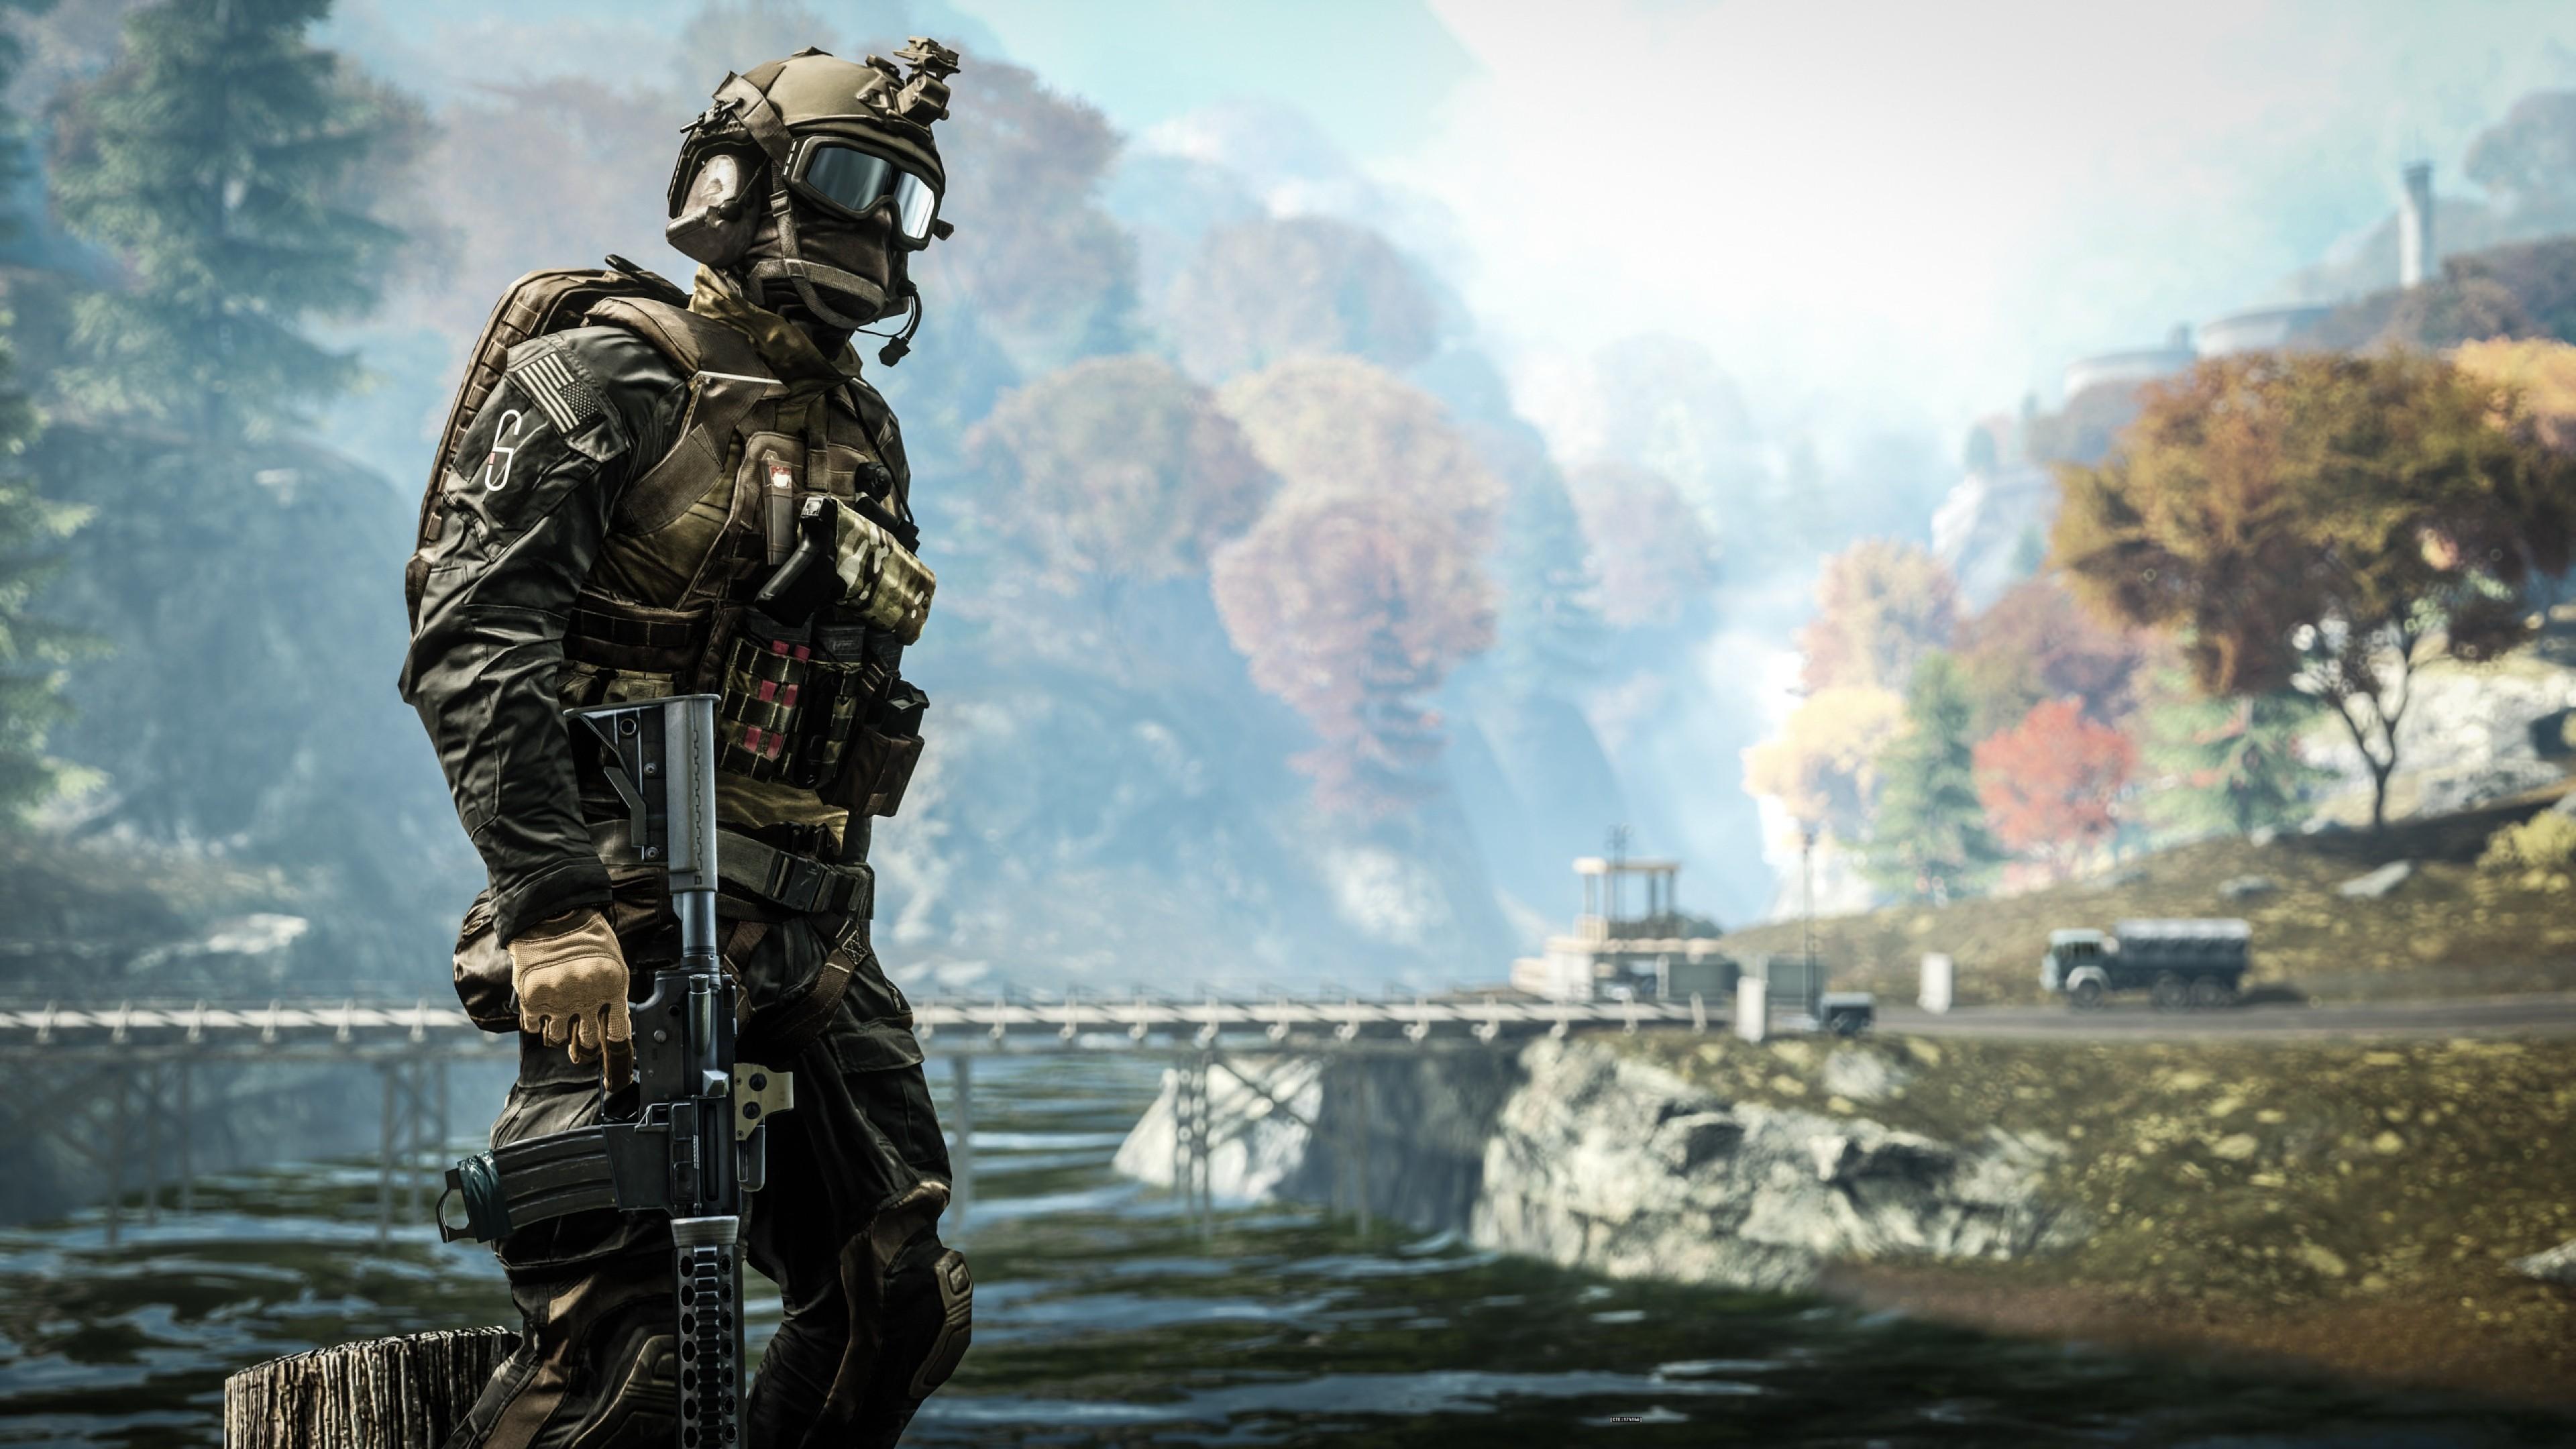 Battlefield 4 Wallpaper Download Free Cool Full Hd